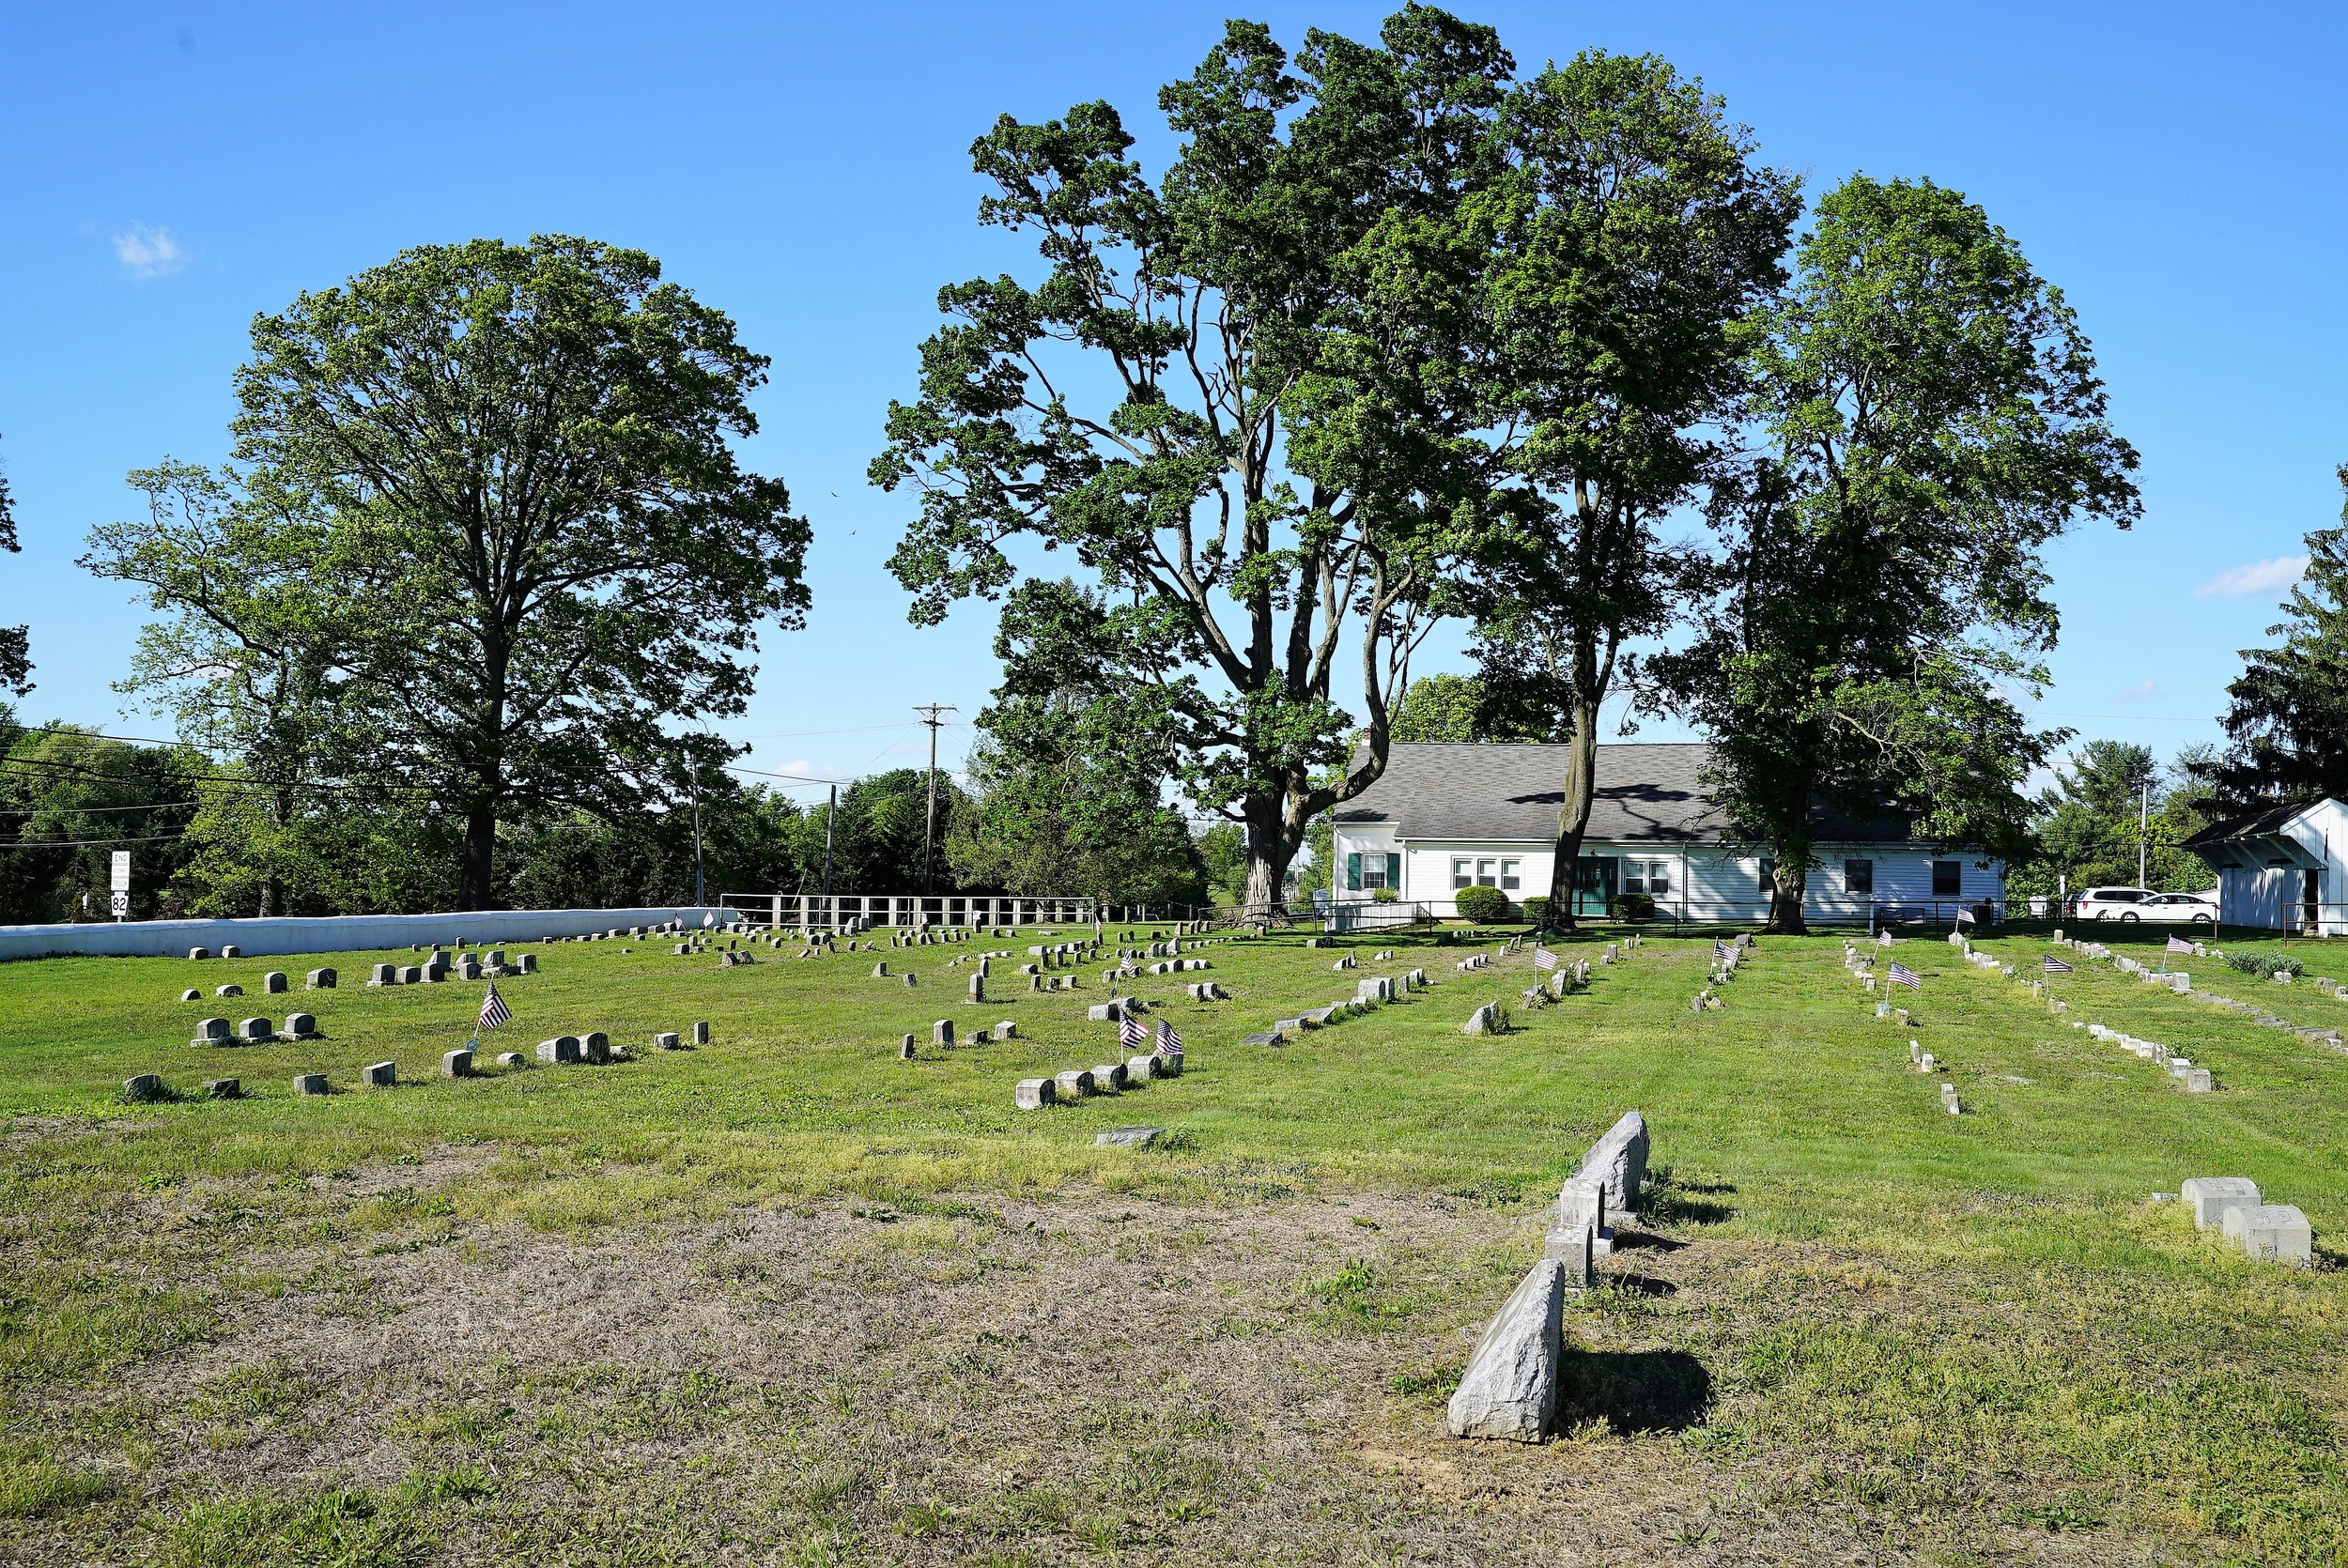 Religious Society Of Friends - Fallowfield Meeting Cemetery. East Fallowfield, Pennsylvania.